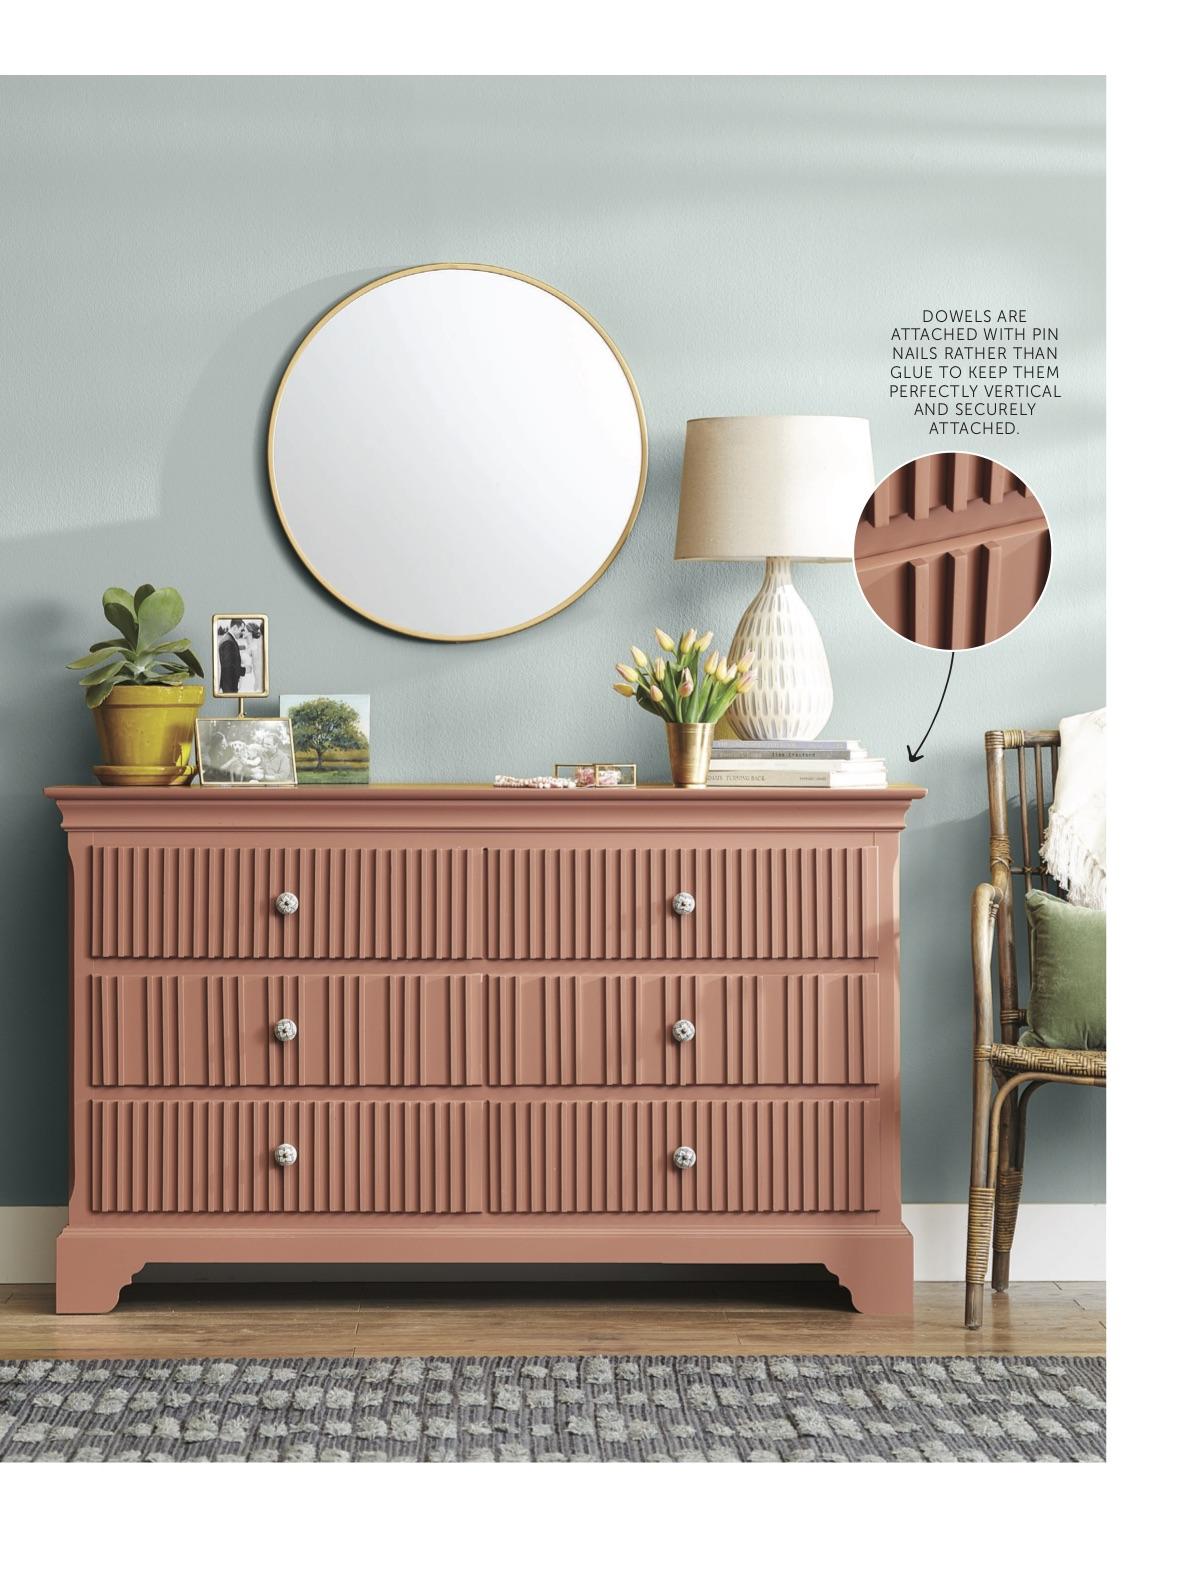 083 DIY1419 Furniture Makeovers.jpg